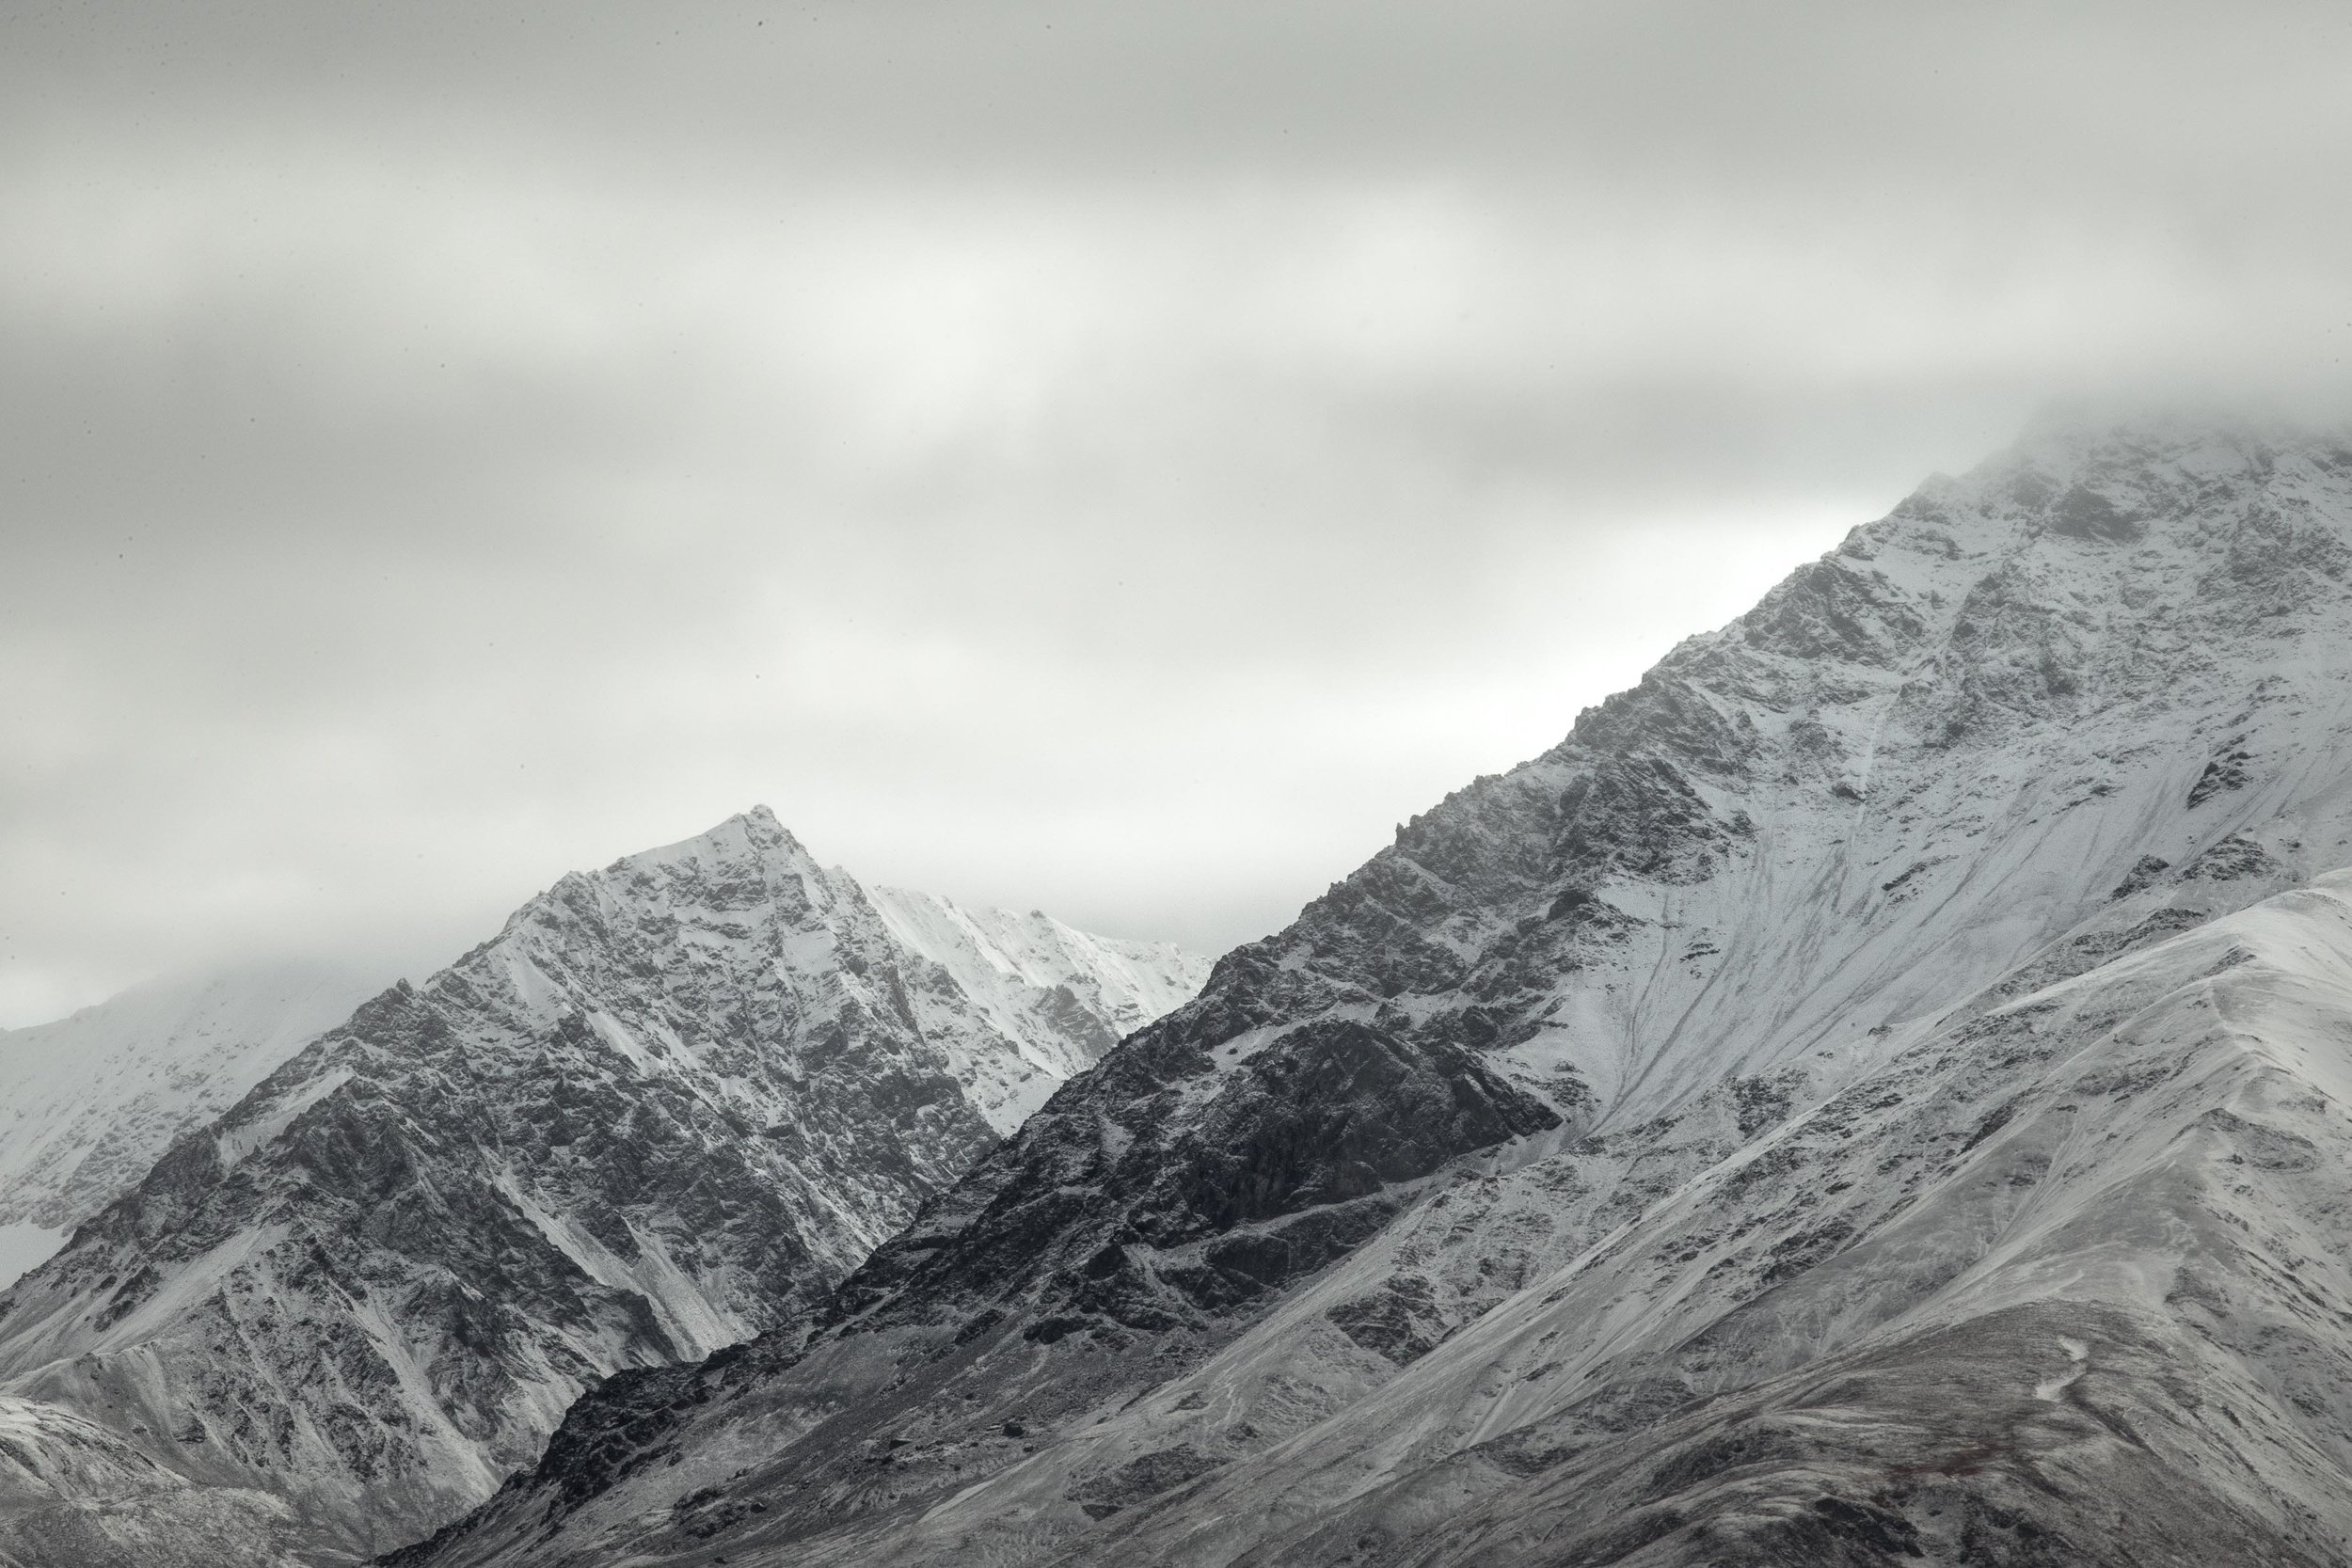 The Alaska Range // Denali National Park, AK // Digital // 2013